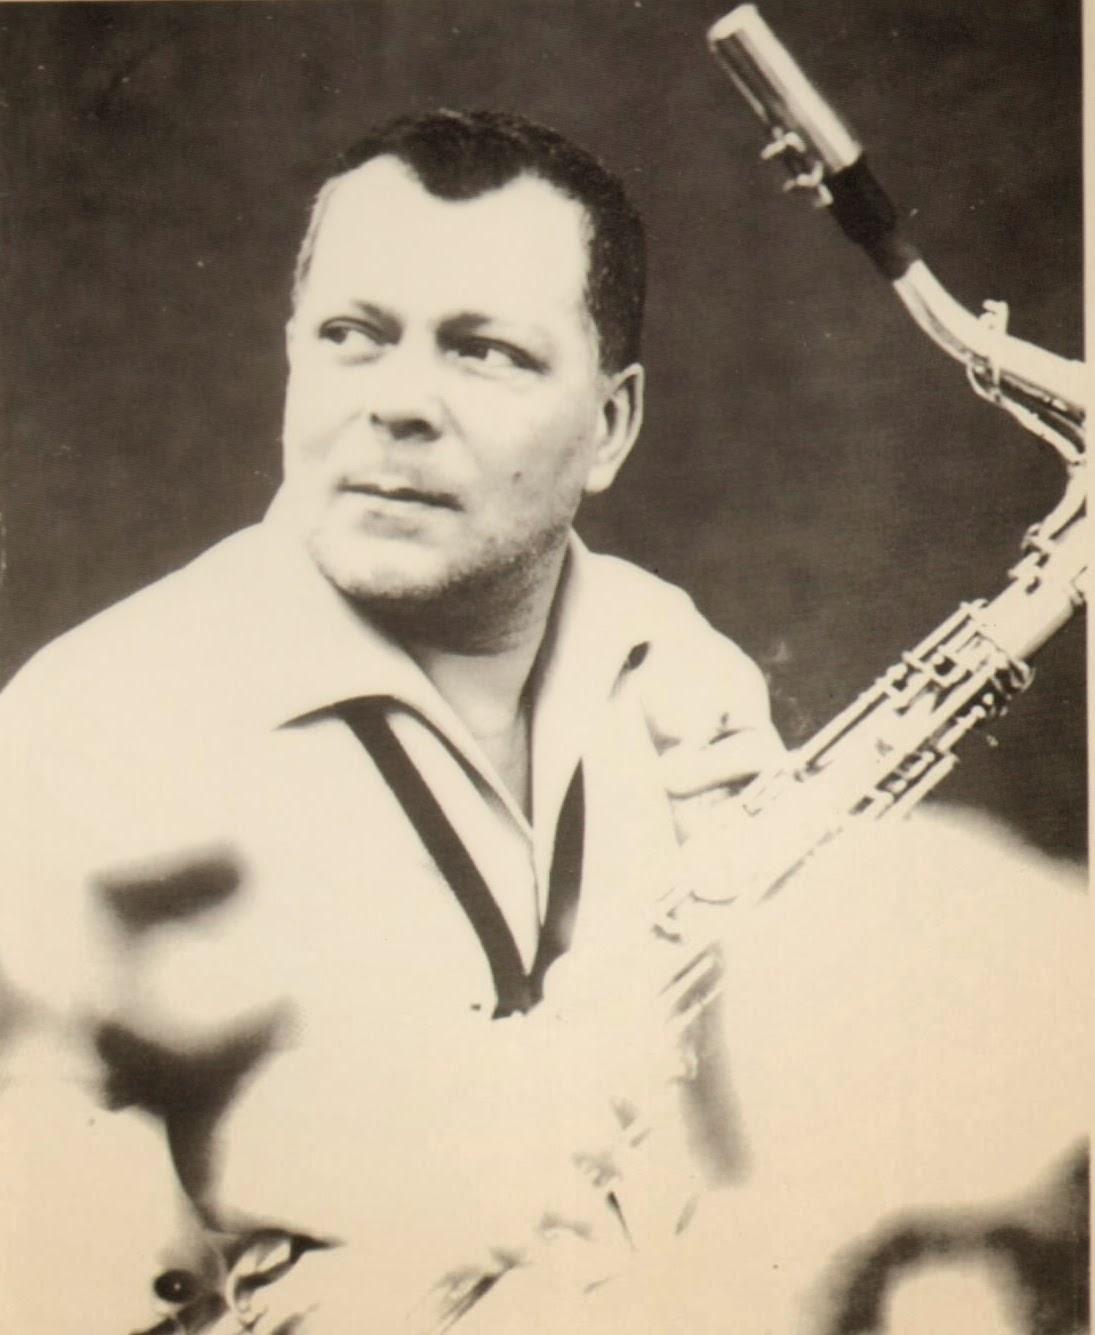 HANS KOLLER (SAXOPHONE) picture